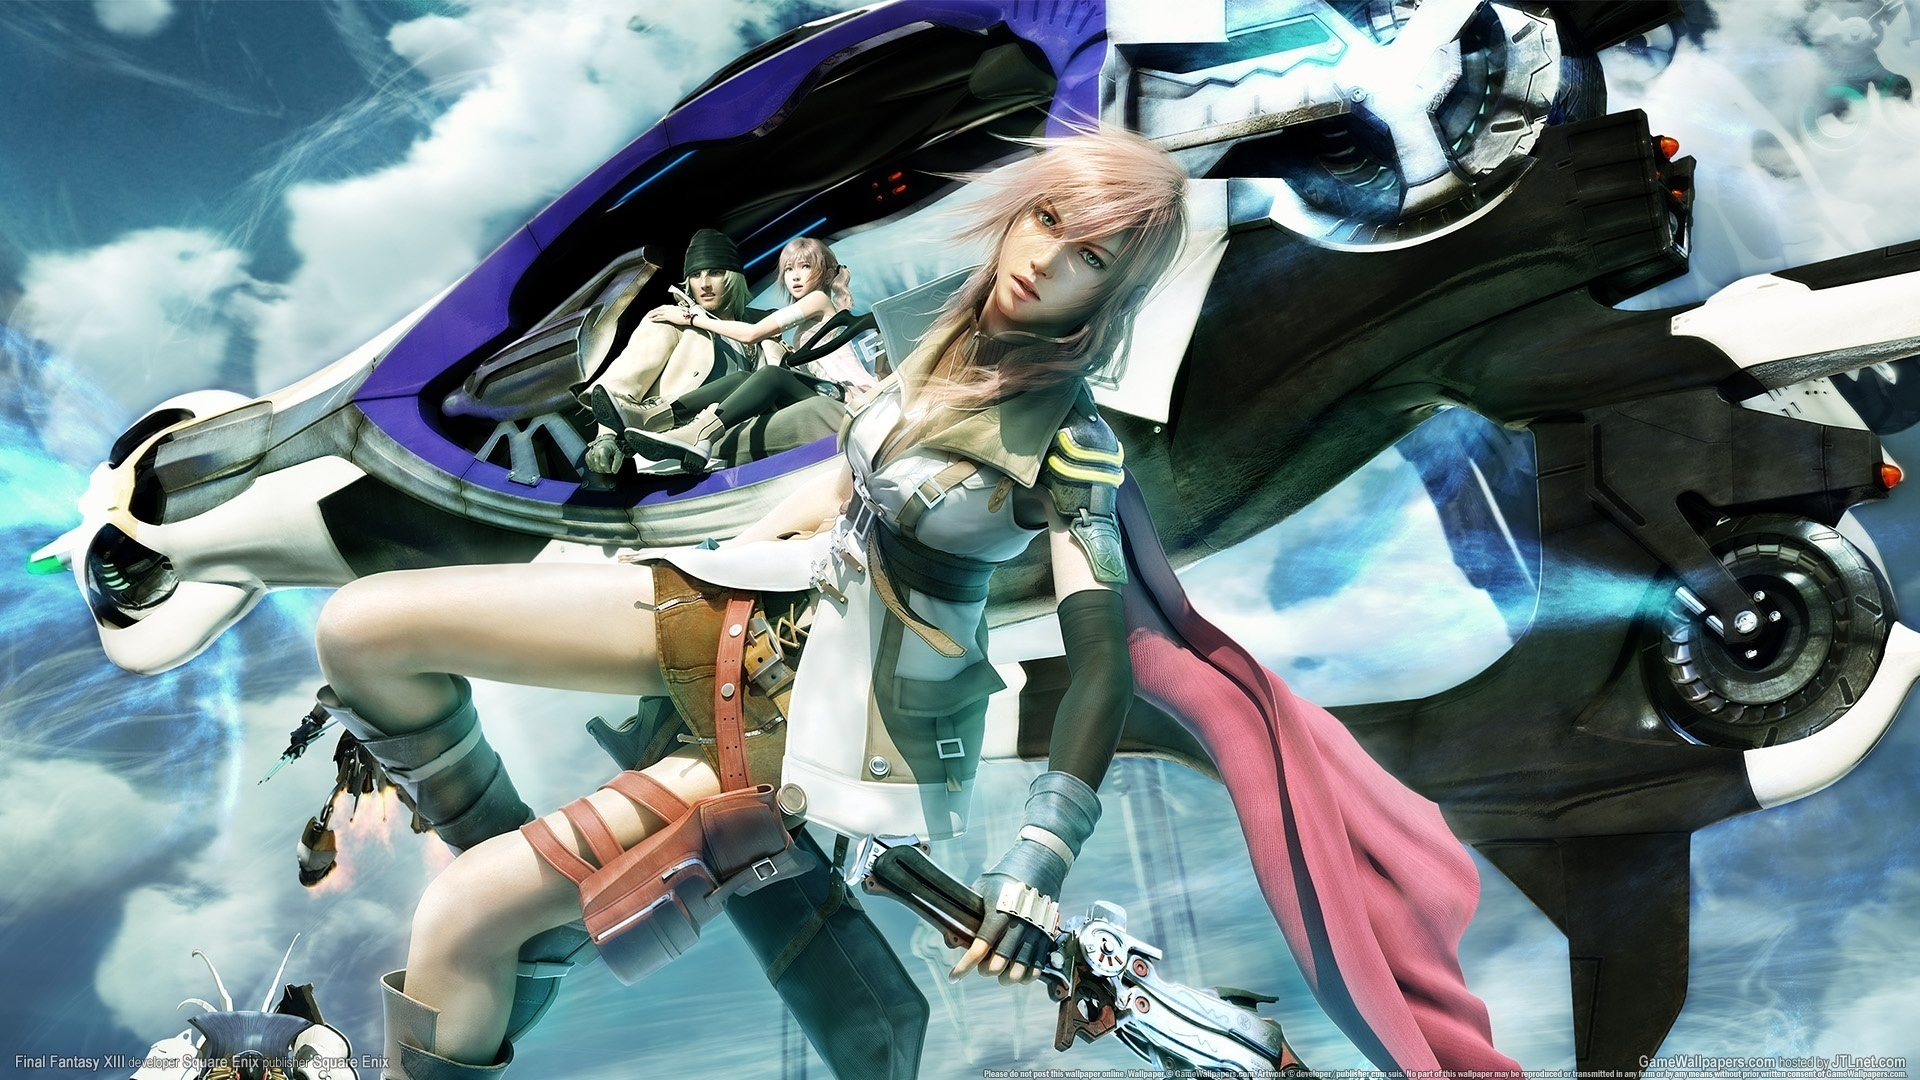 https://kr.best-wallpaper.net/wallpaper/1920x1080/1107/Final-Fantasy-XIII-game-characters_1920x1080.jpg